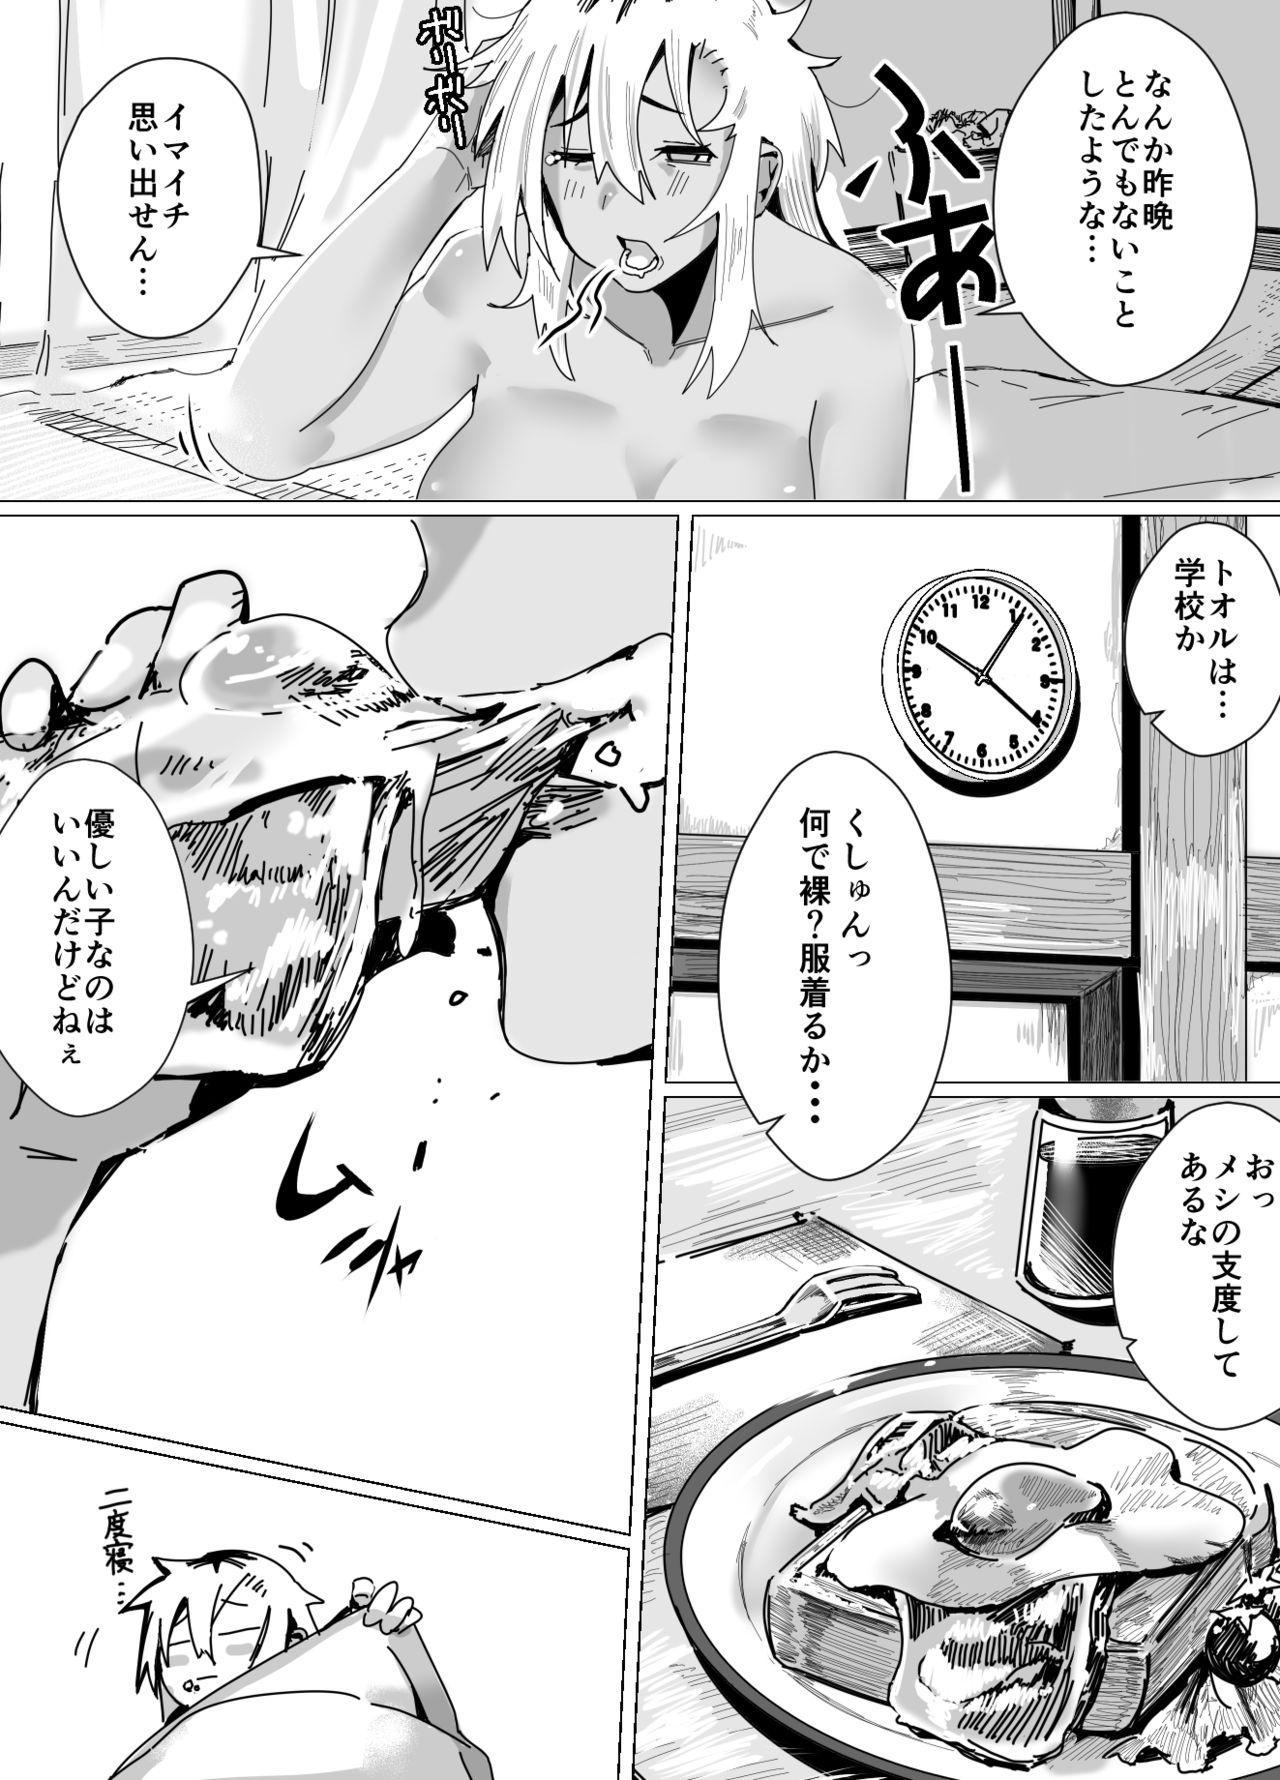 Miwaku no Yanmama Ecchi na Kosodate Hisshouhou 5